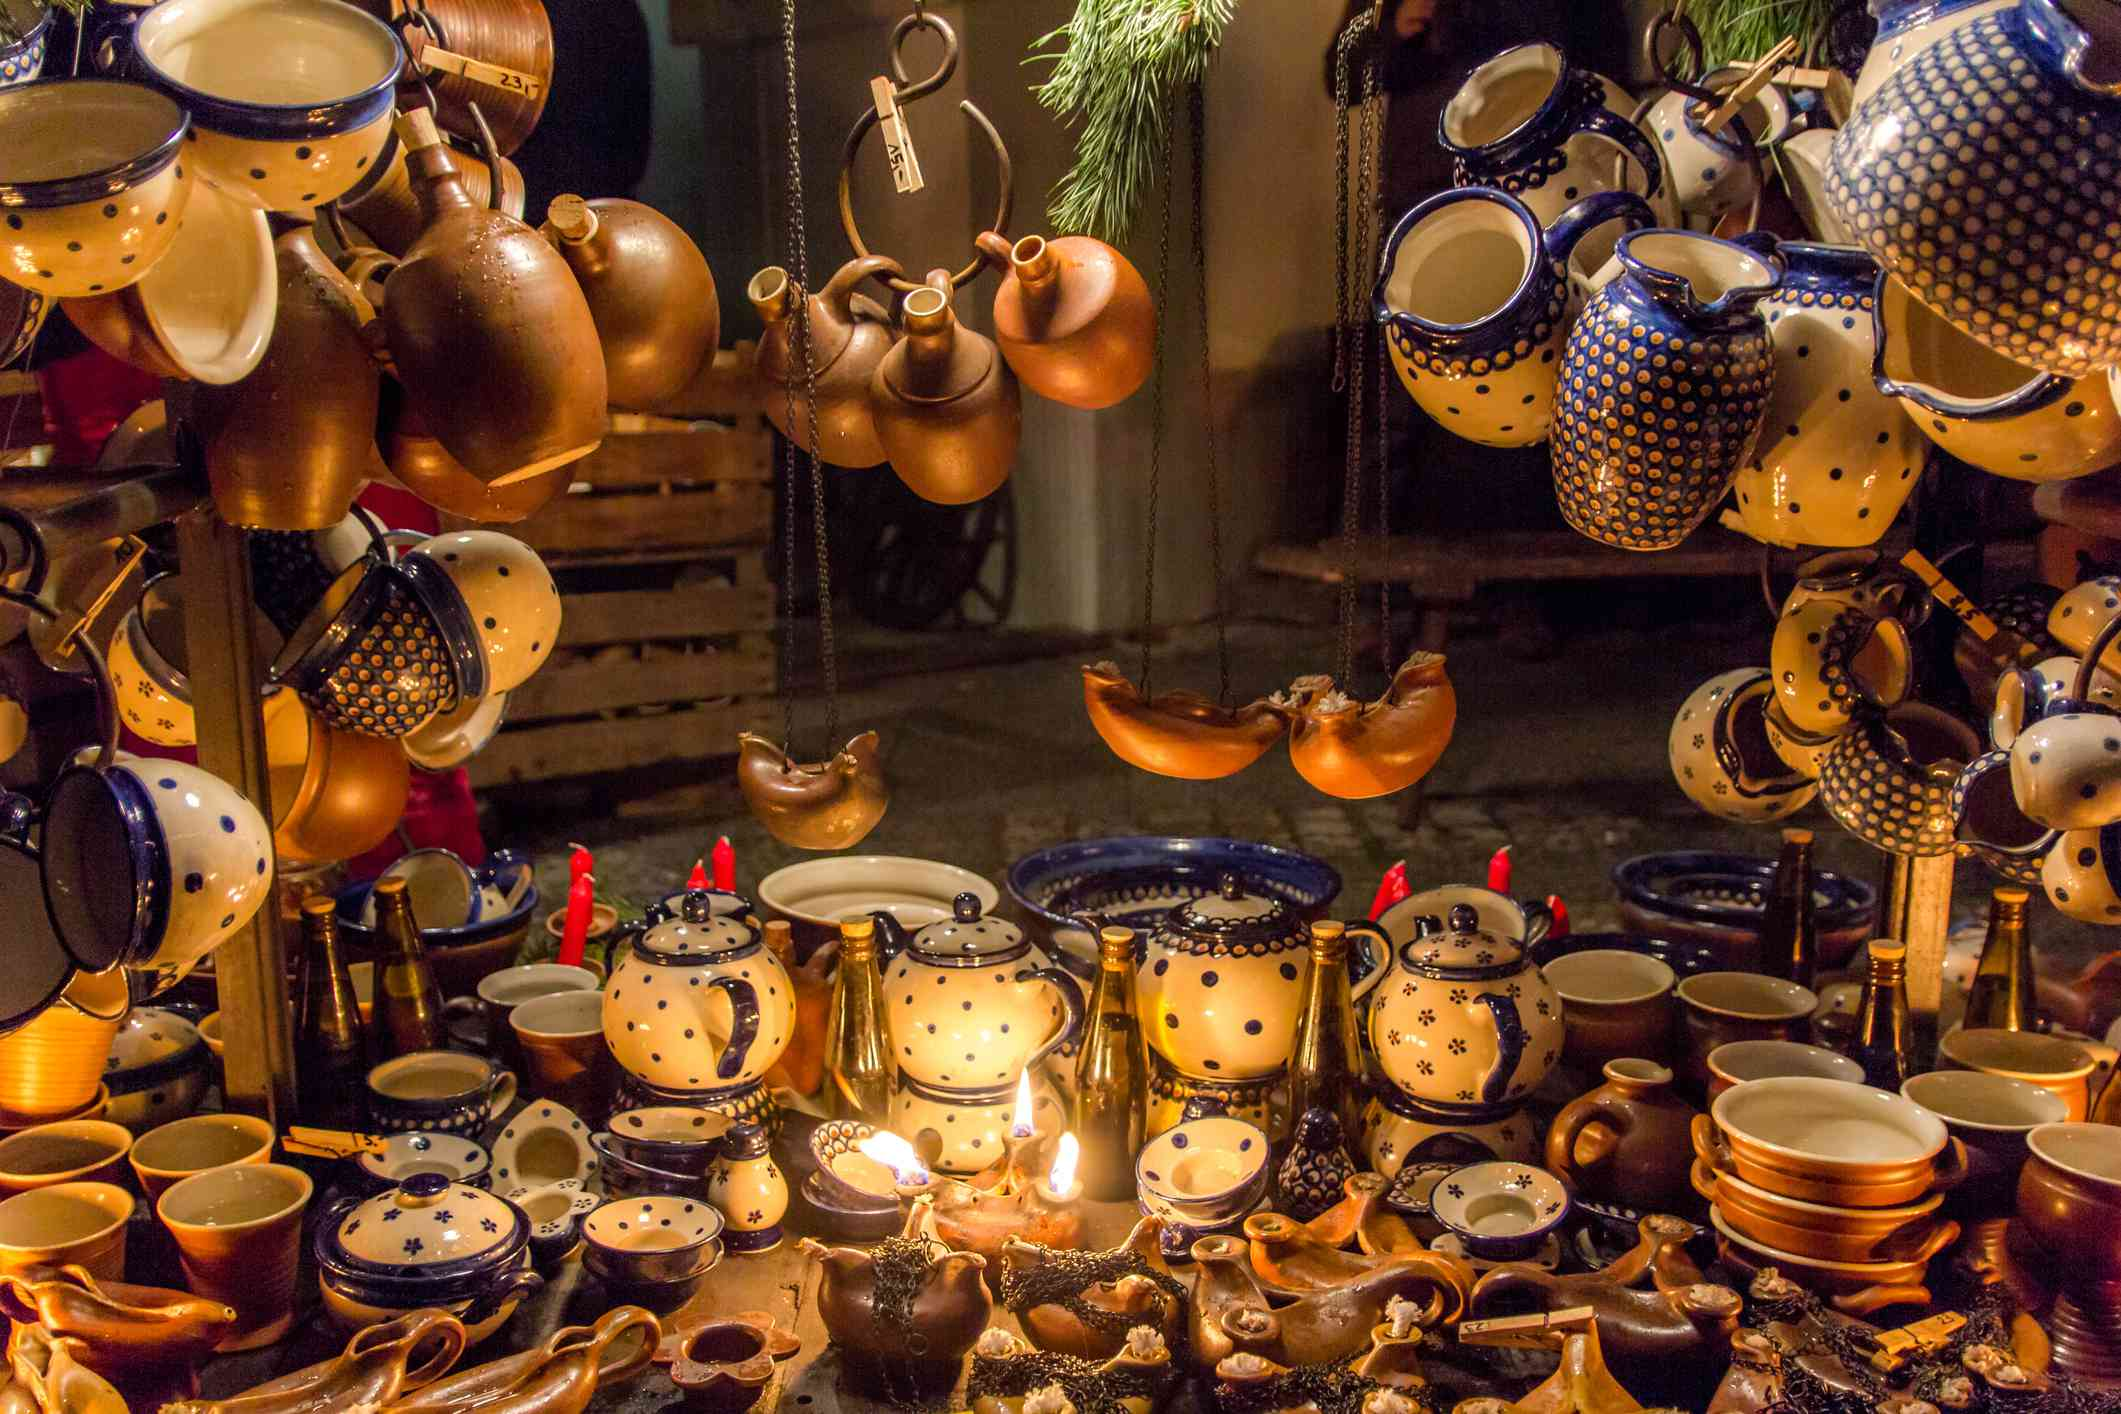 Vintage pots and pans